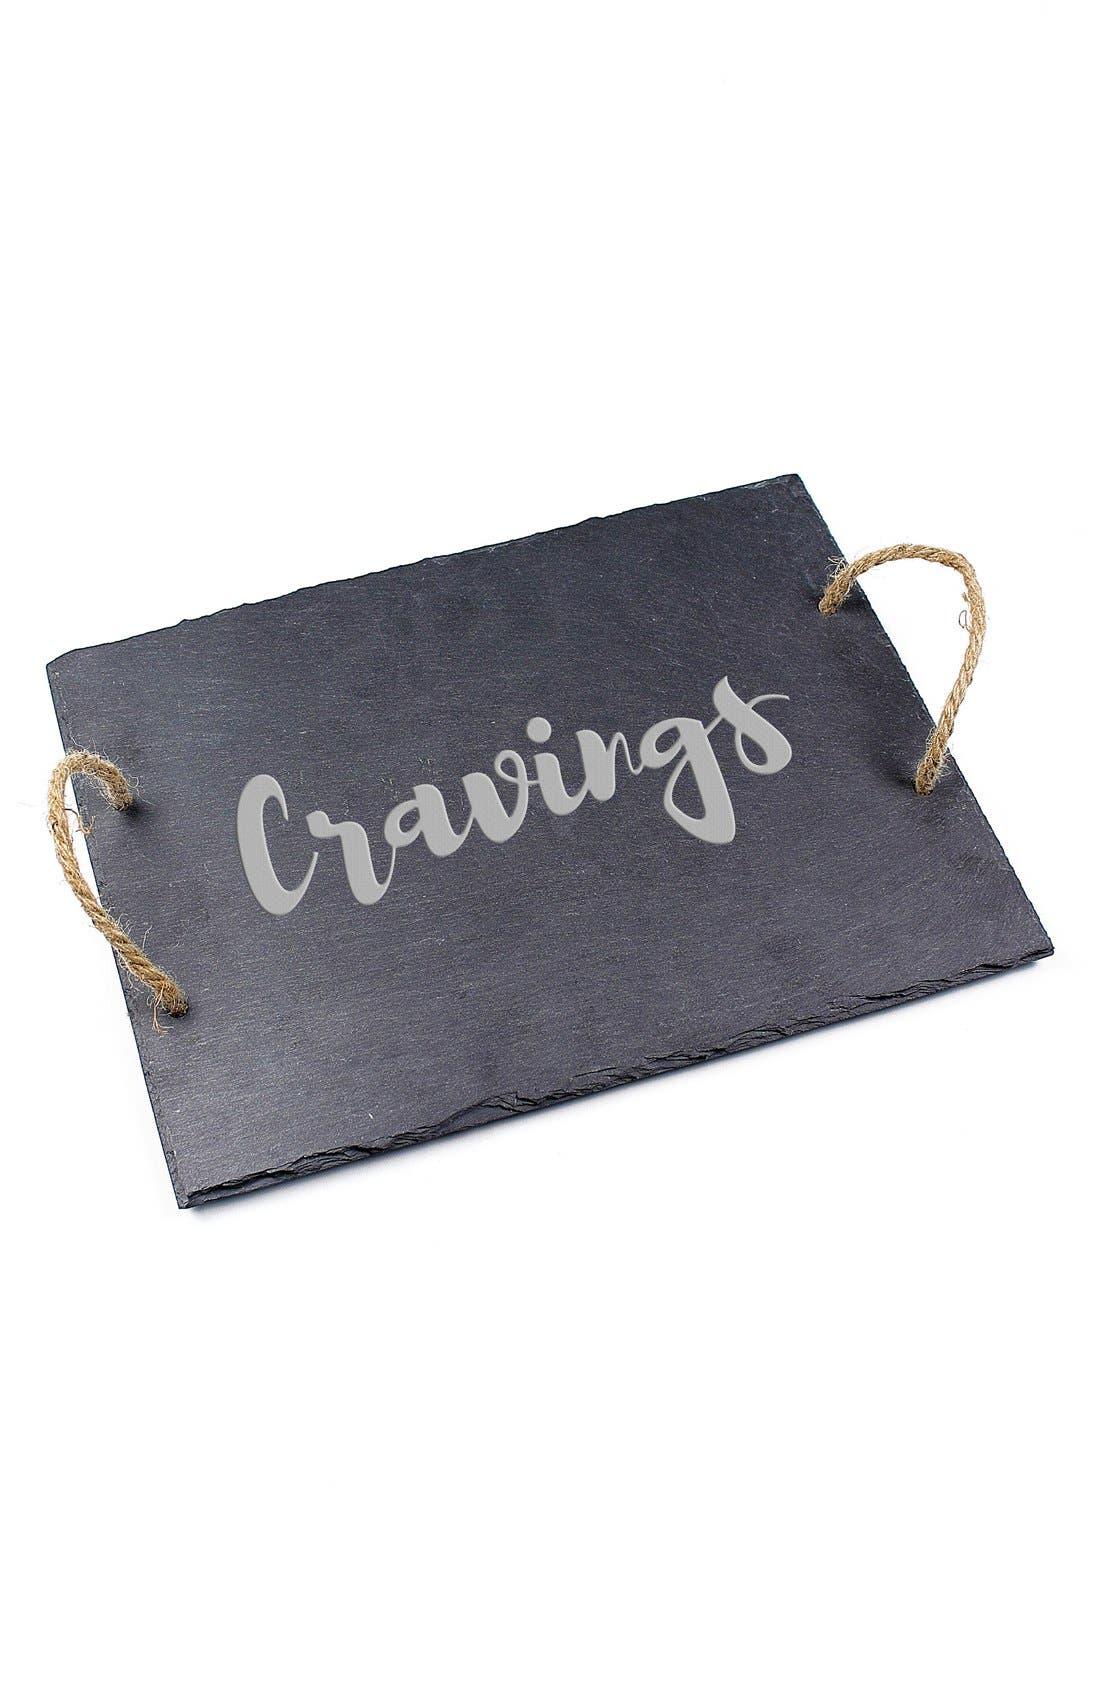 'Cravings' Slate Serving Board,                             Alternate thumbnail 2, color,                             001